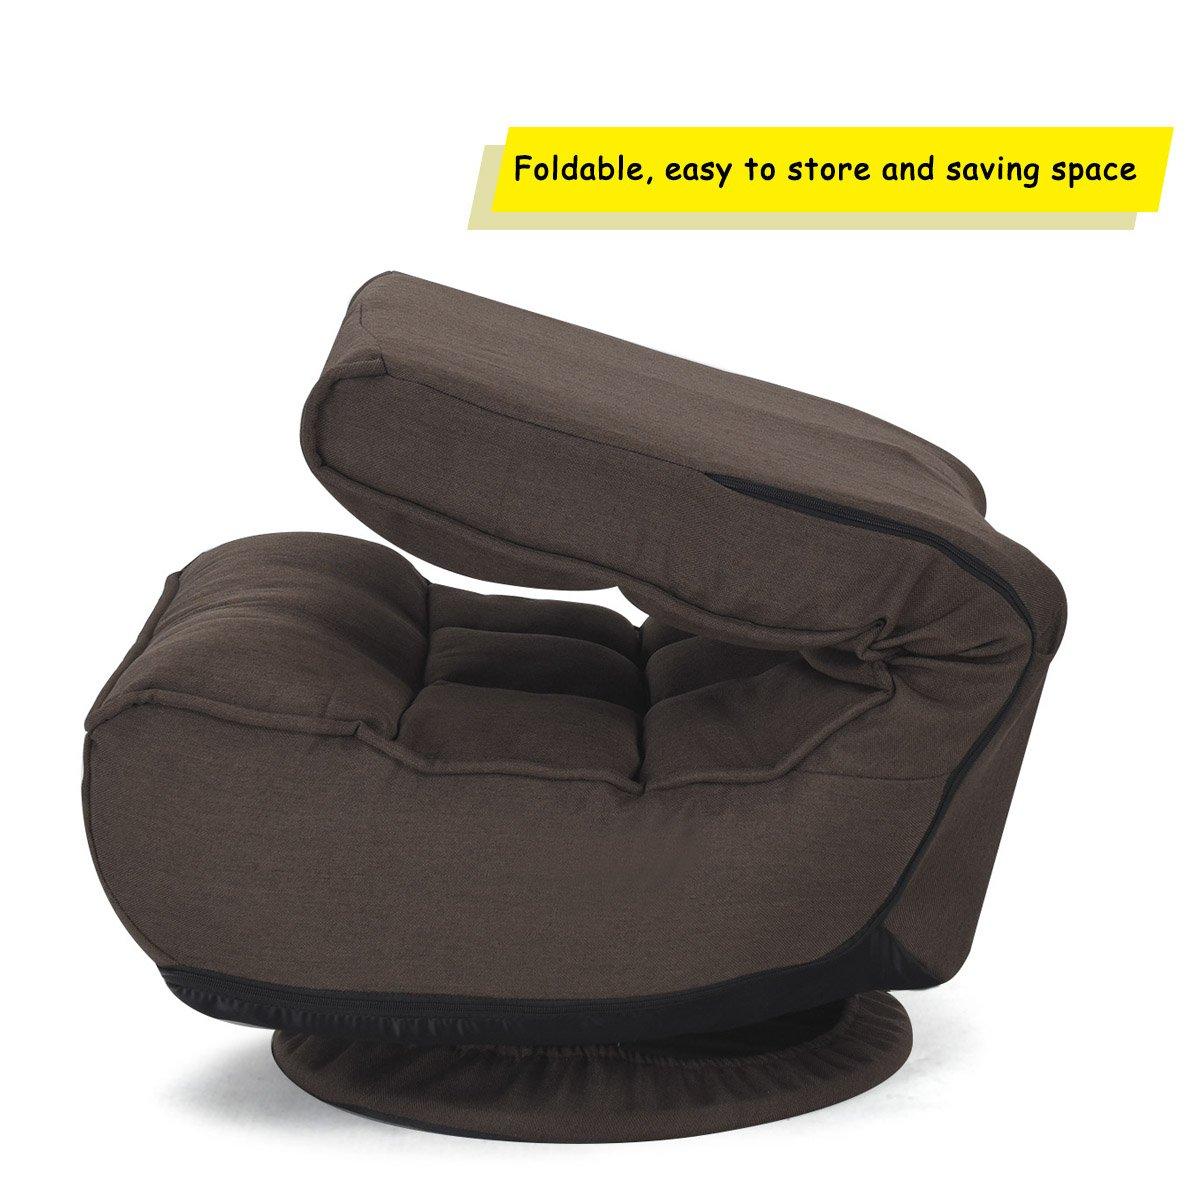 Fold Up Sofa Chair